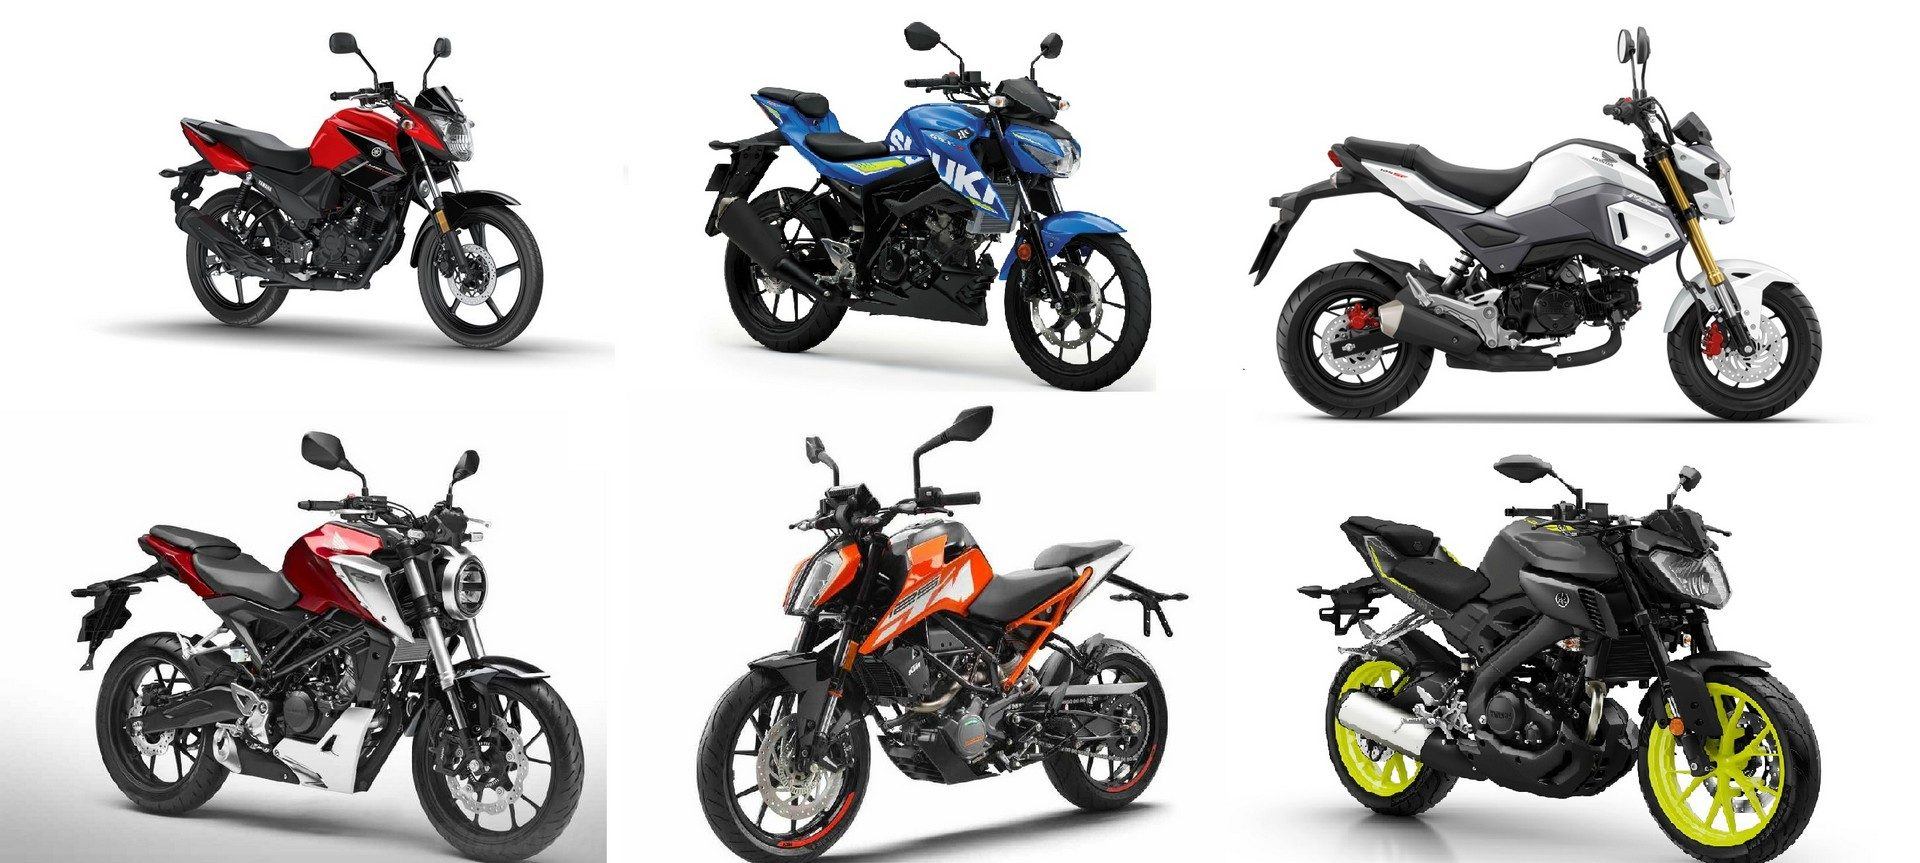 Las mejores motos naked de 125